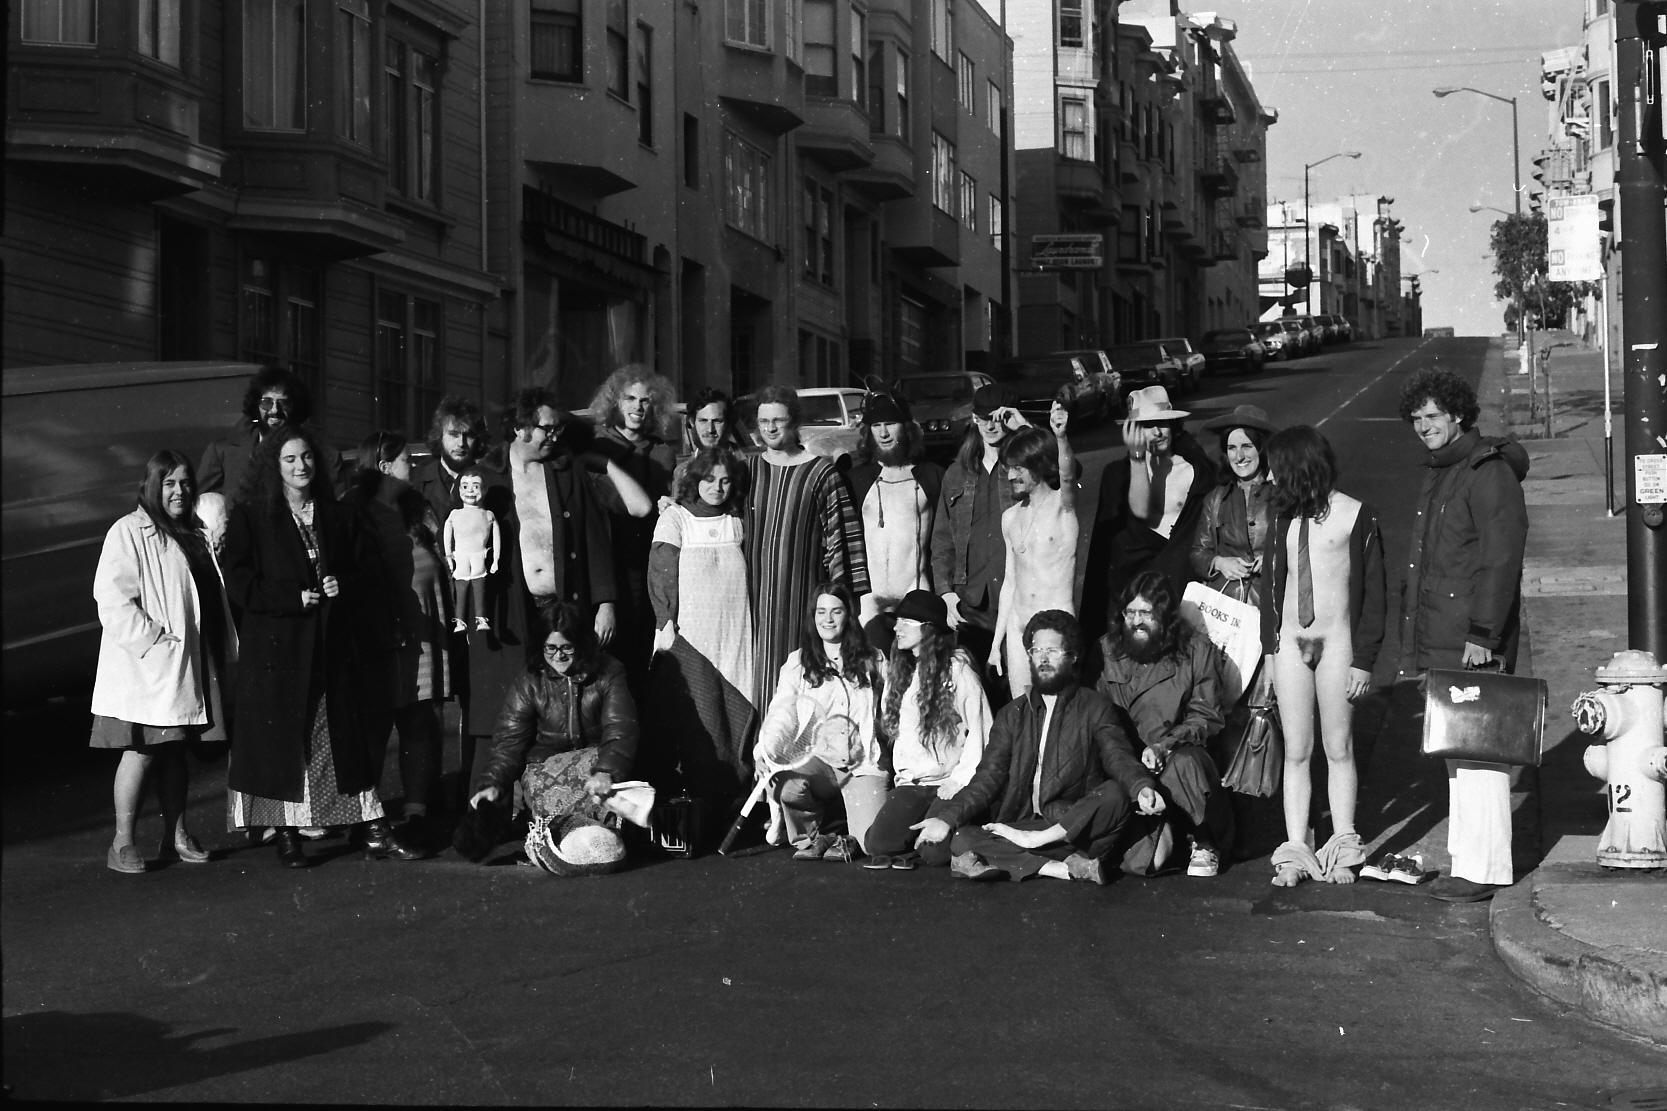 group-portrait-2.jpg